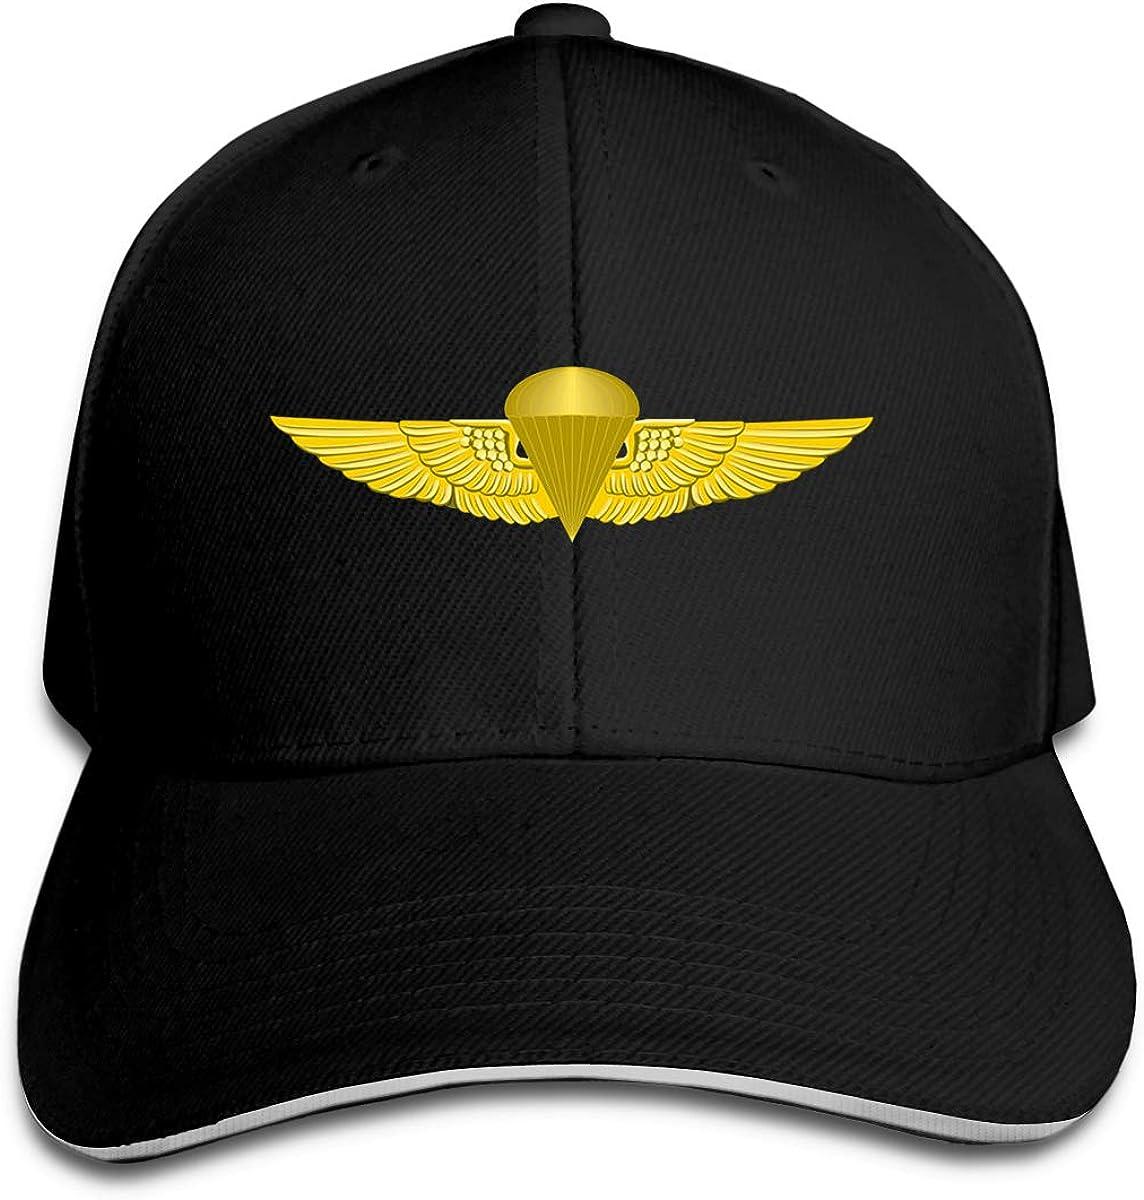 Marine Corps Jump Wings Unisex Adult Baseball Caps Adjustable Sandwich Caps Jeans Caps Adjustable Denim Trucker Cap